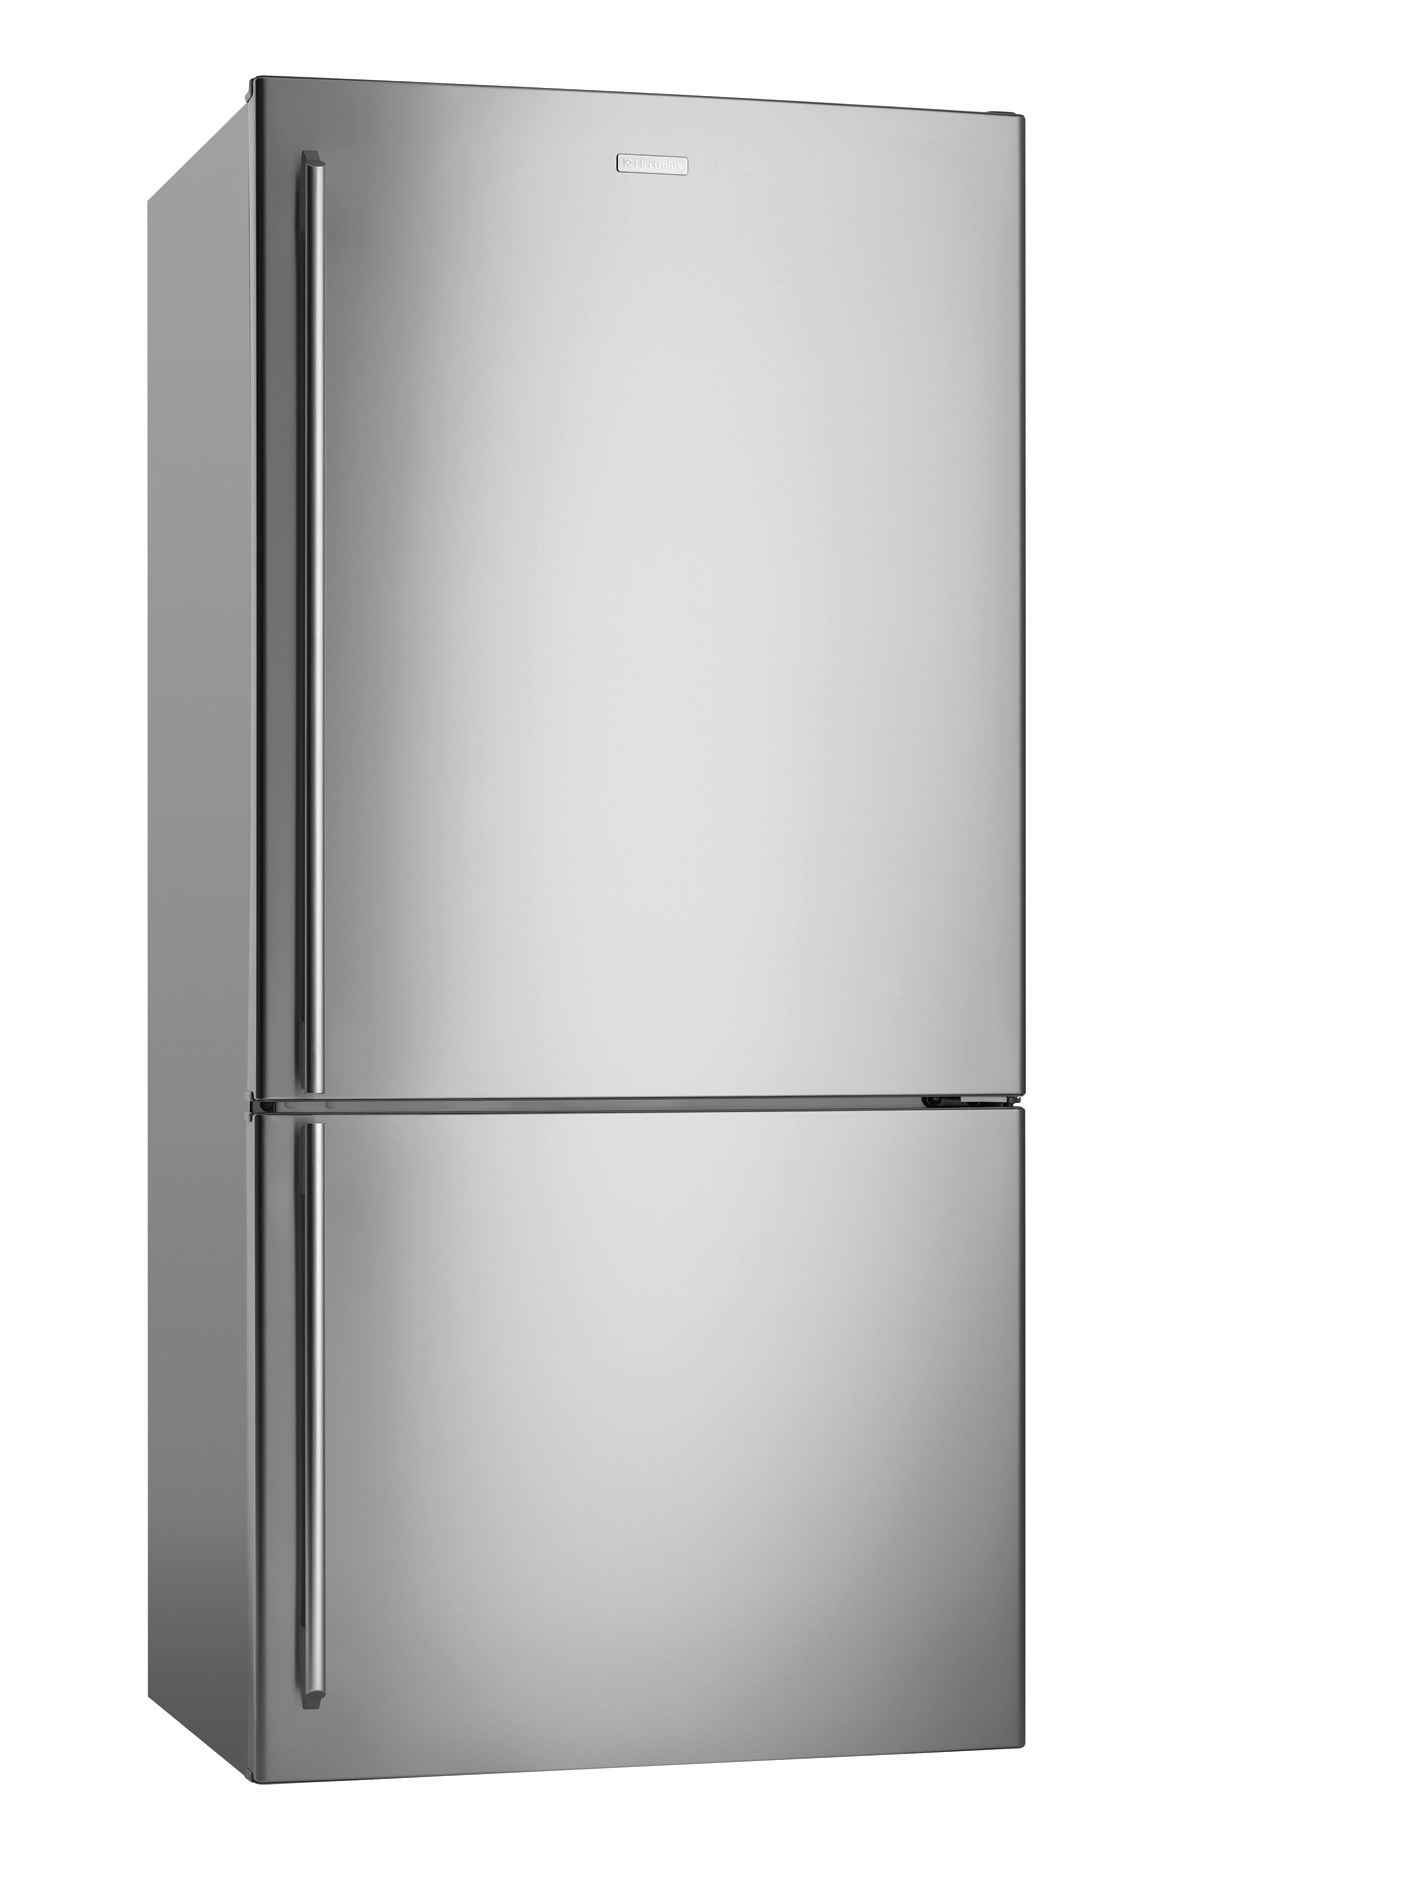 Energy Saving Electrolux Refrigerator